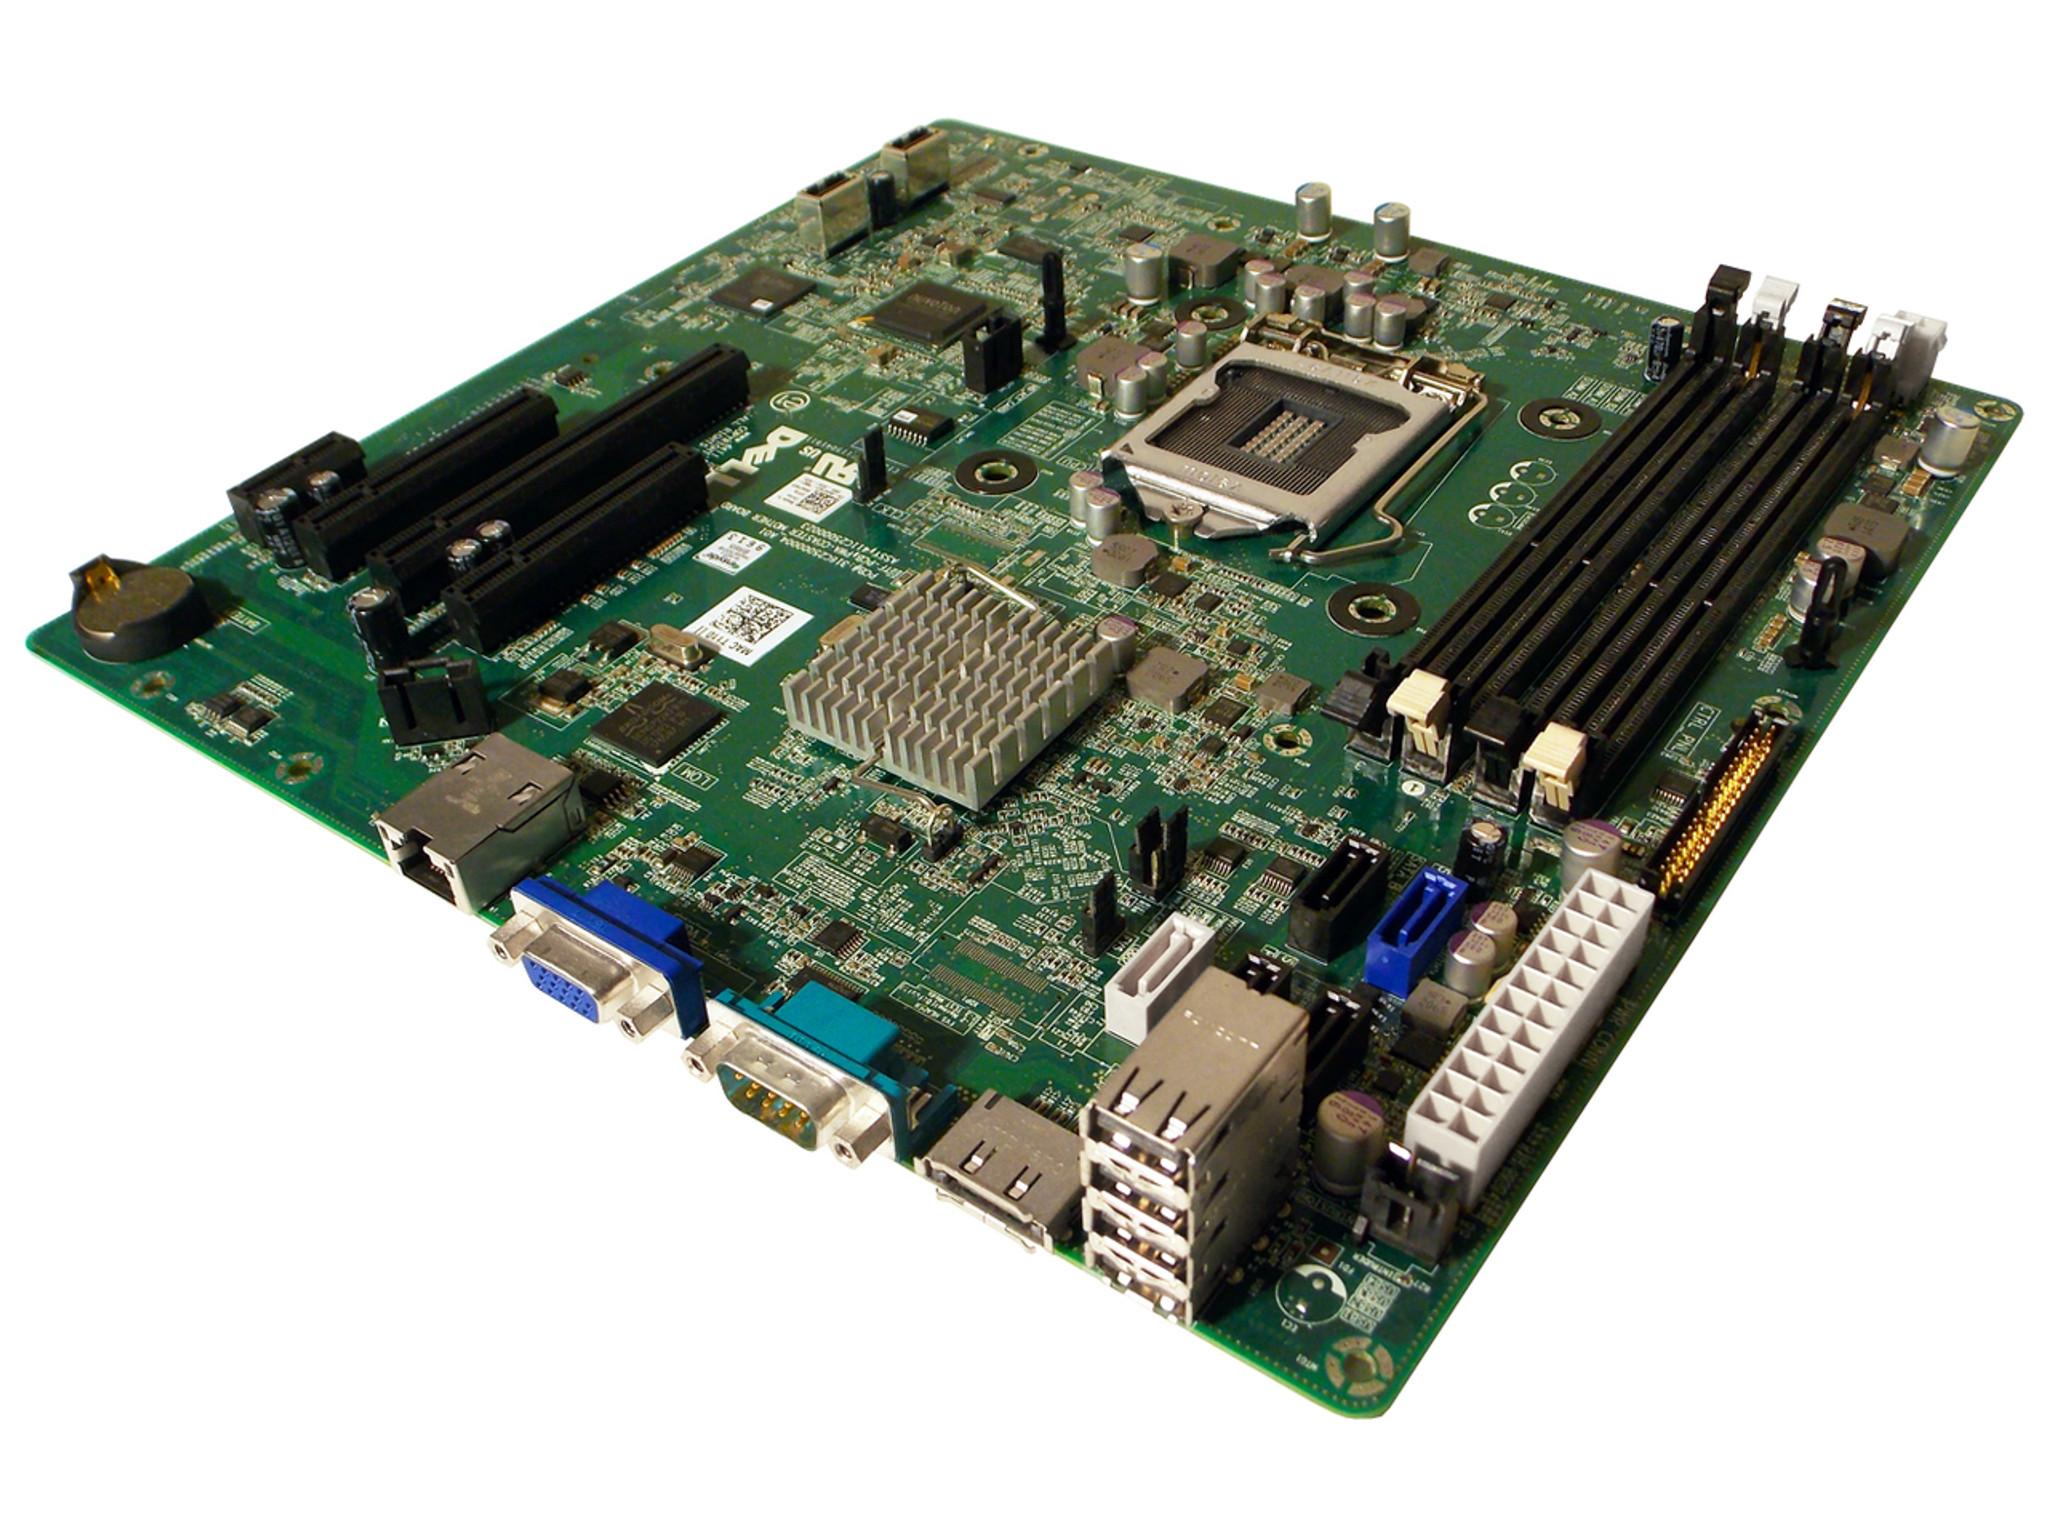 Dell Poweredge T110 Ii Manual